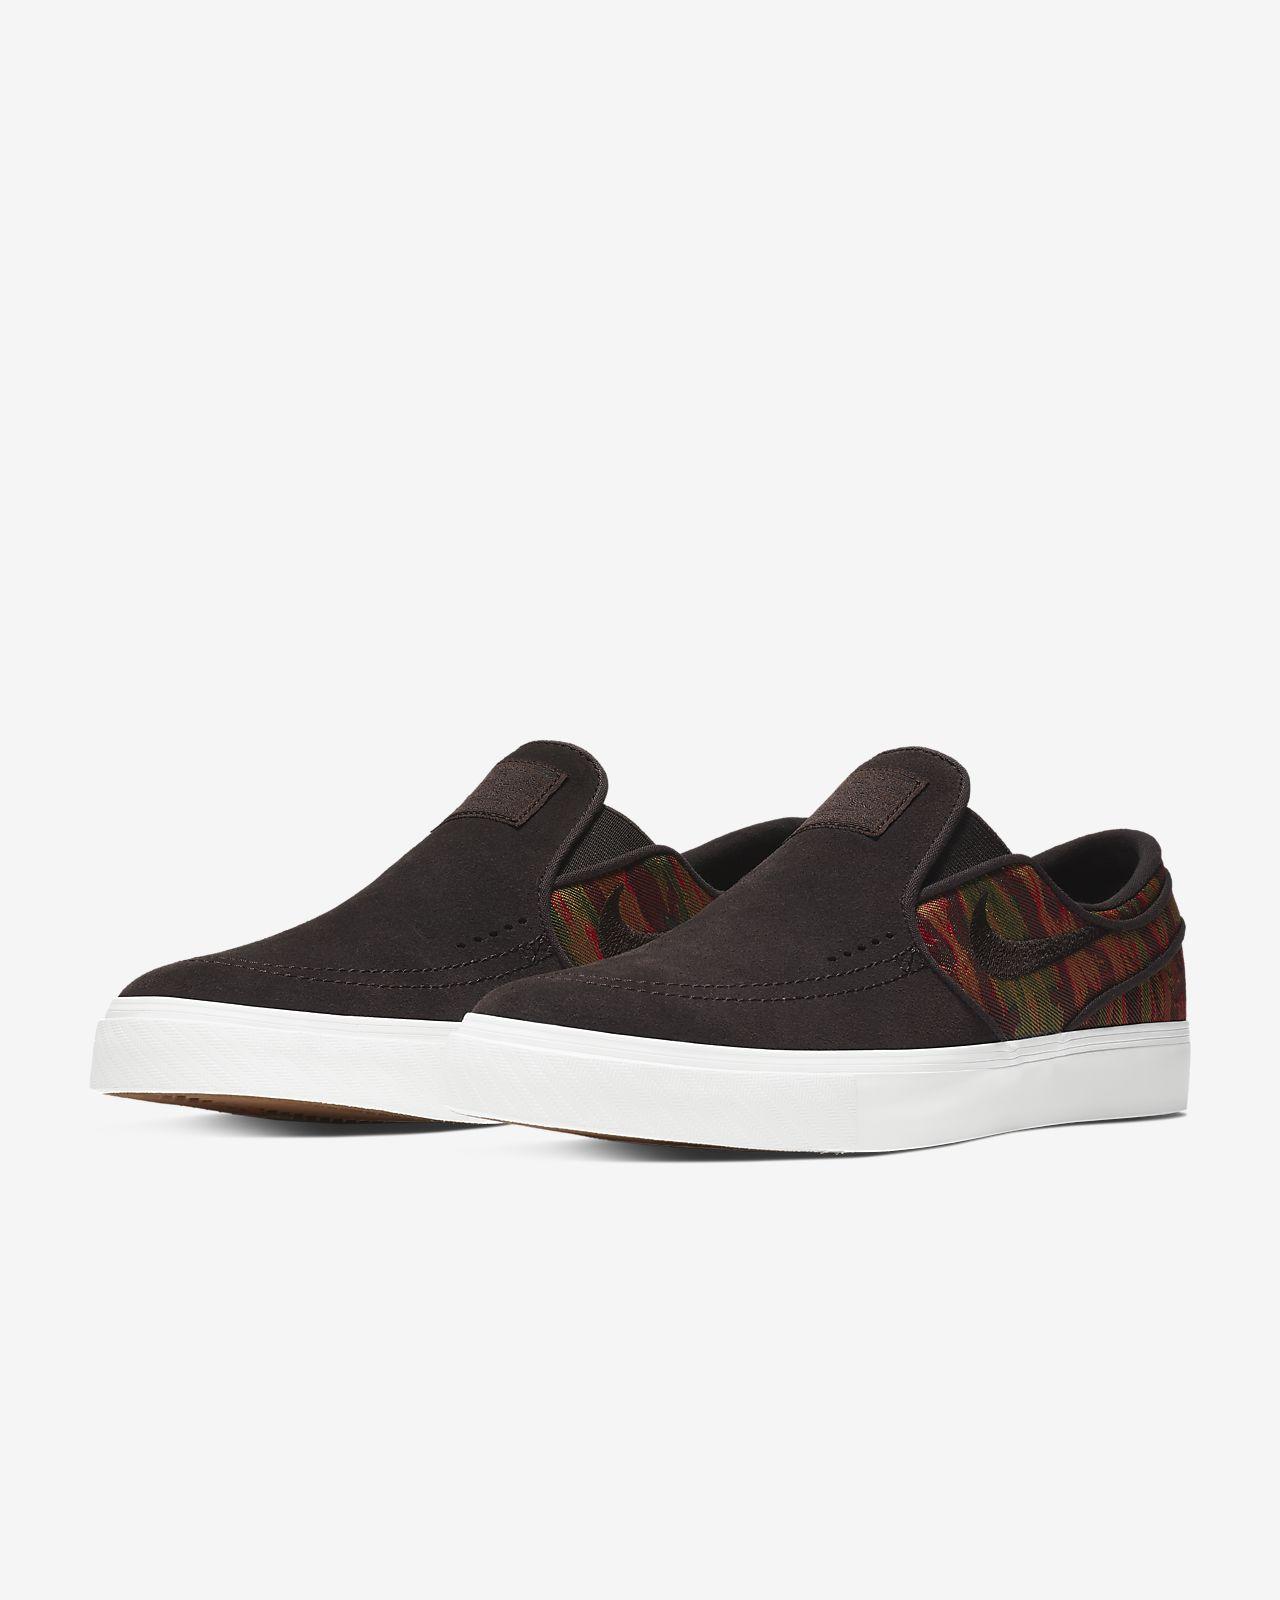 56f37f574ef Nike SB Zoom Stefan Janoski Slip-On Premium Men s Skateboarding Shoe ...